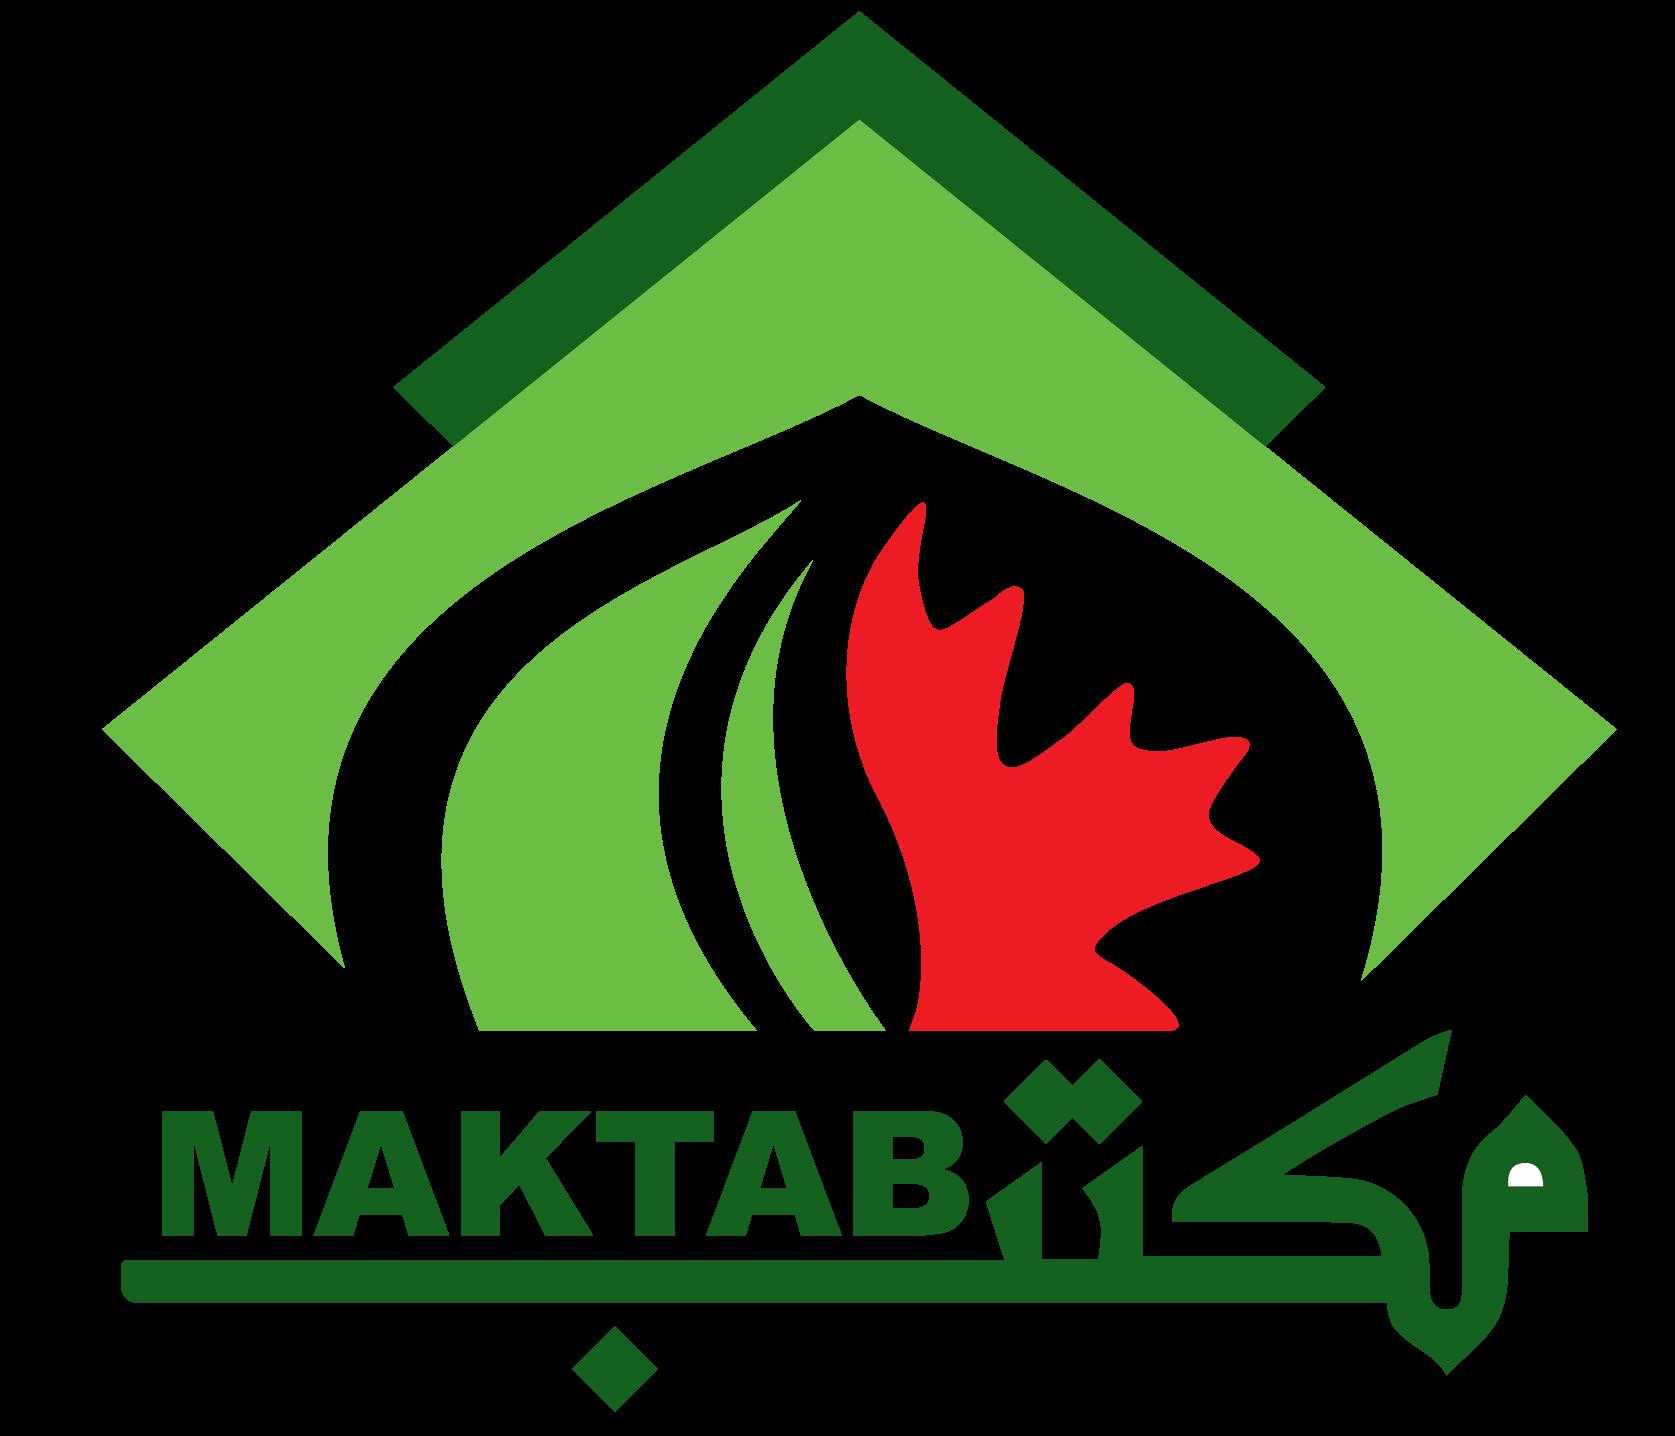 ACIC Maktab